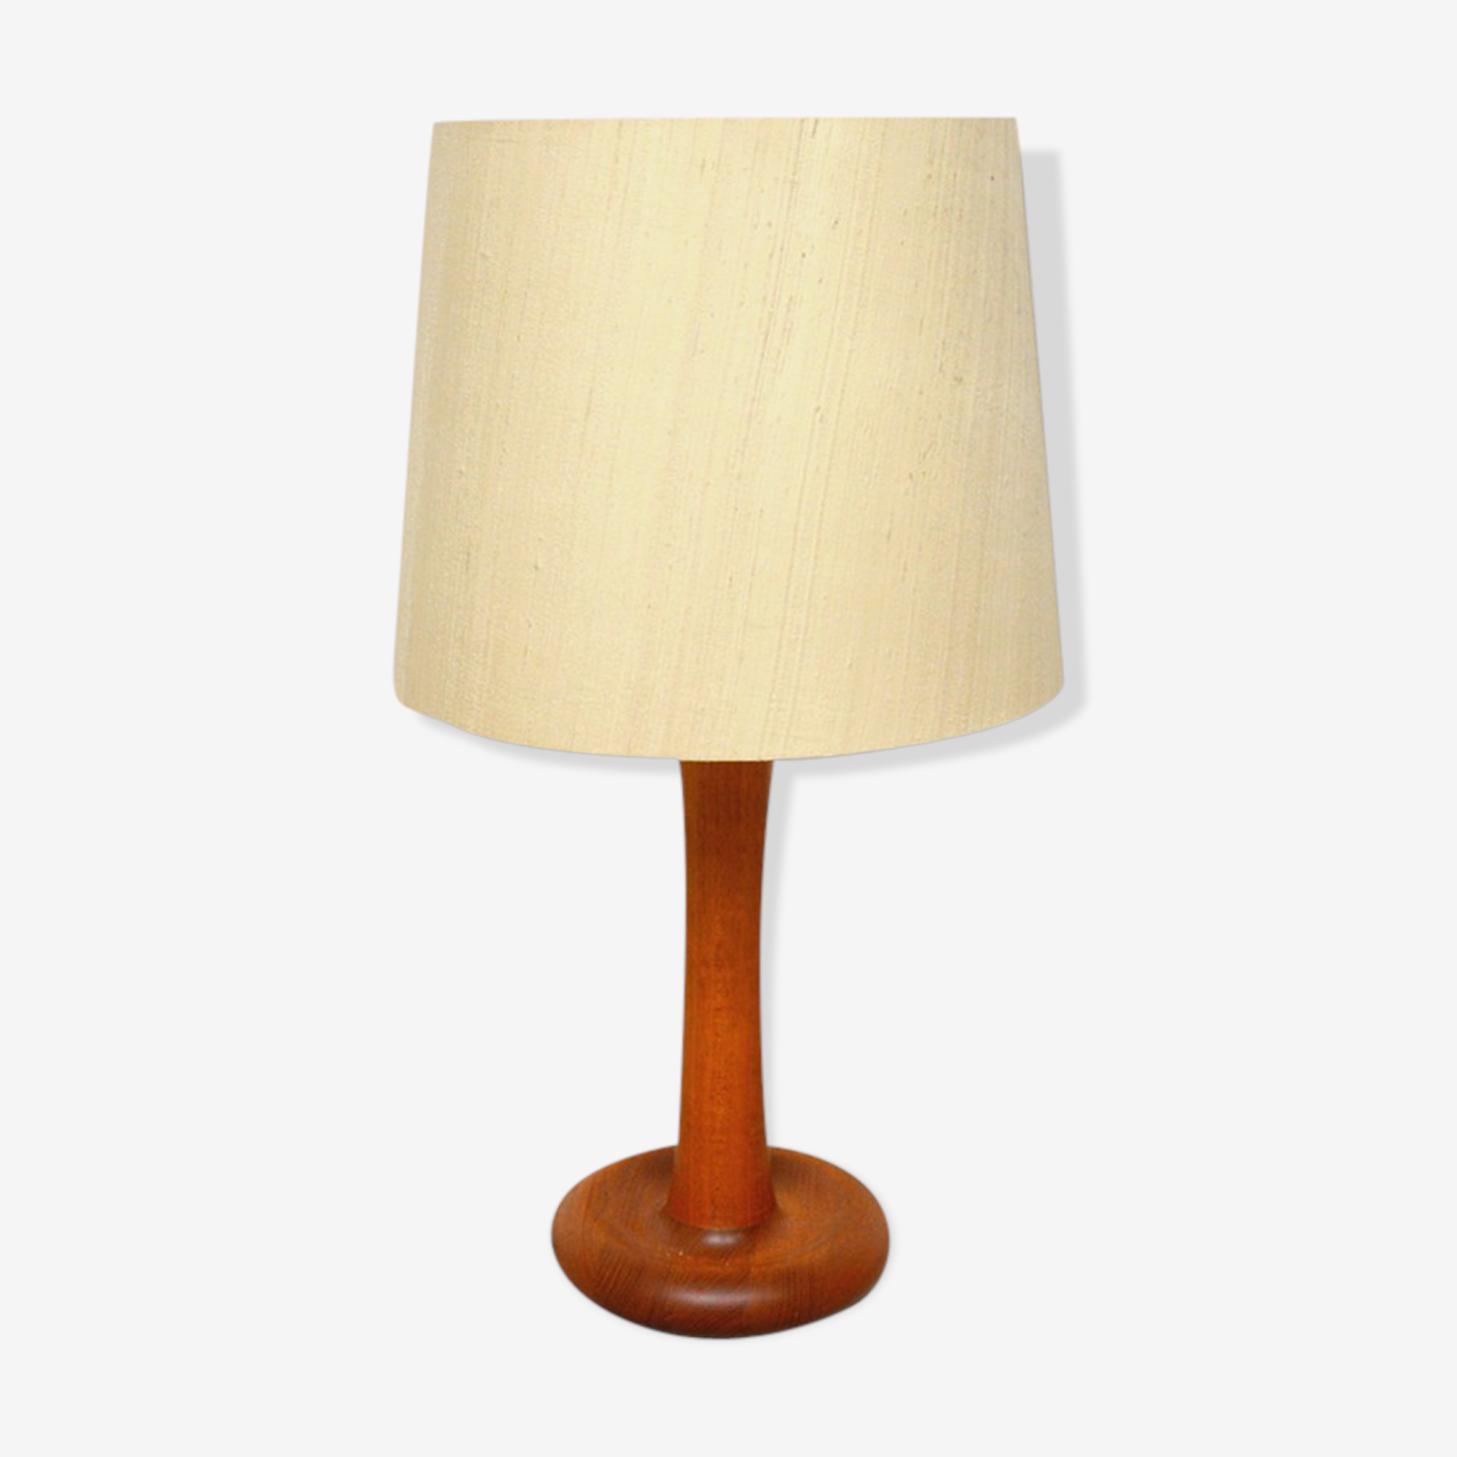 Lampe à poser danoise Dyrlund, 1960